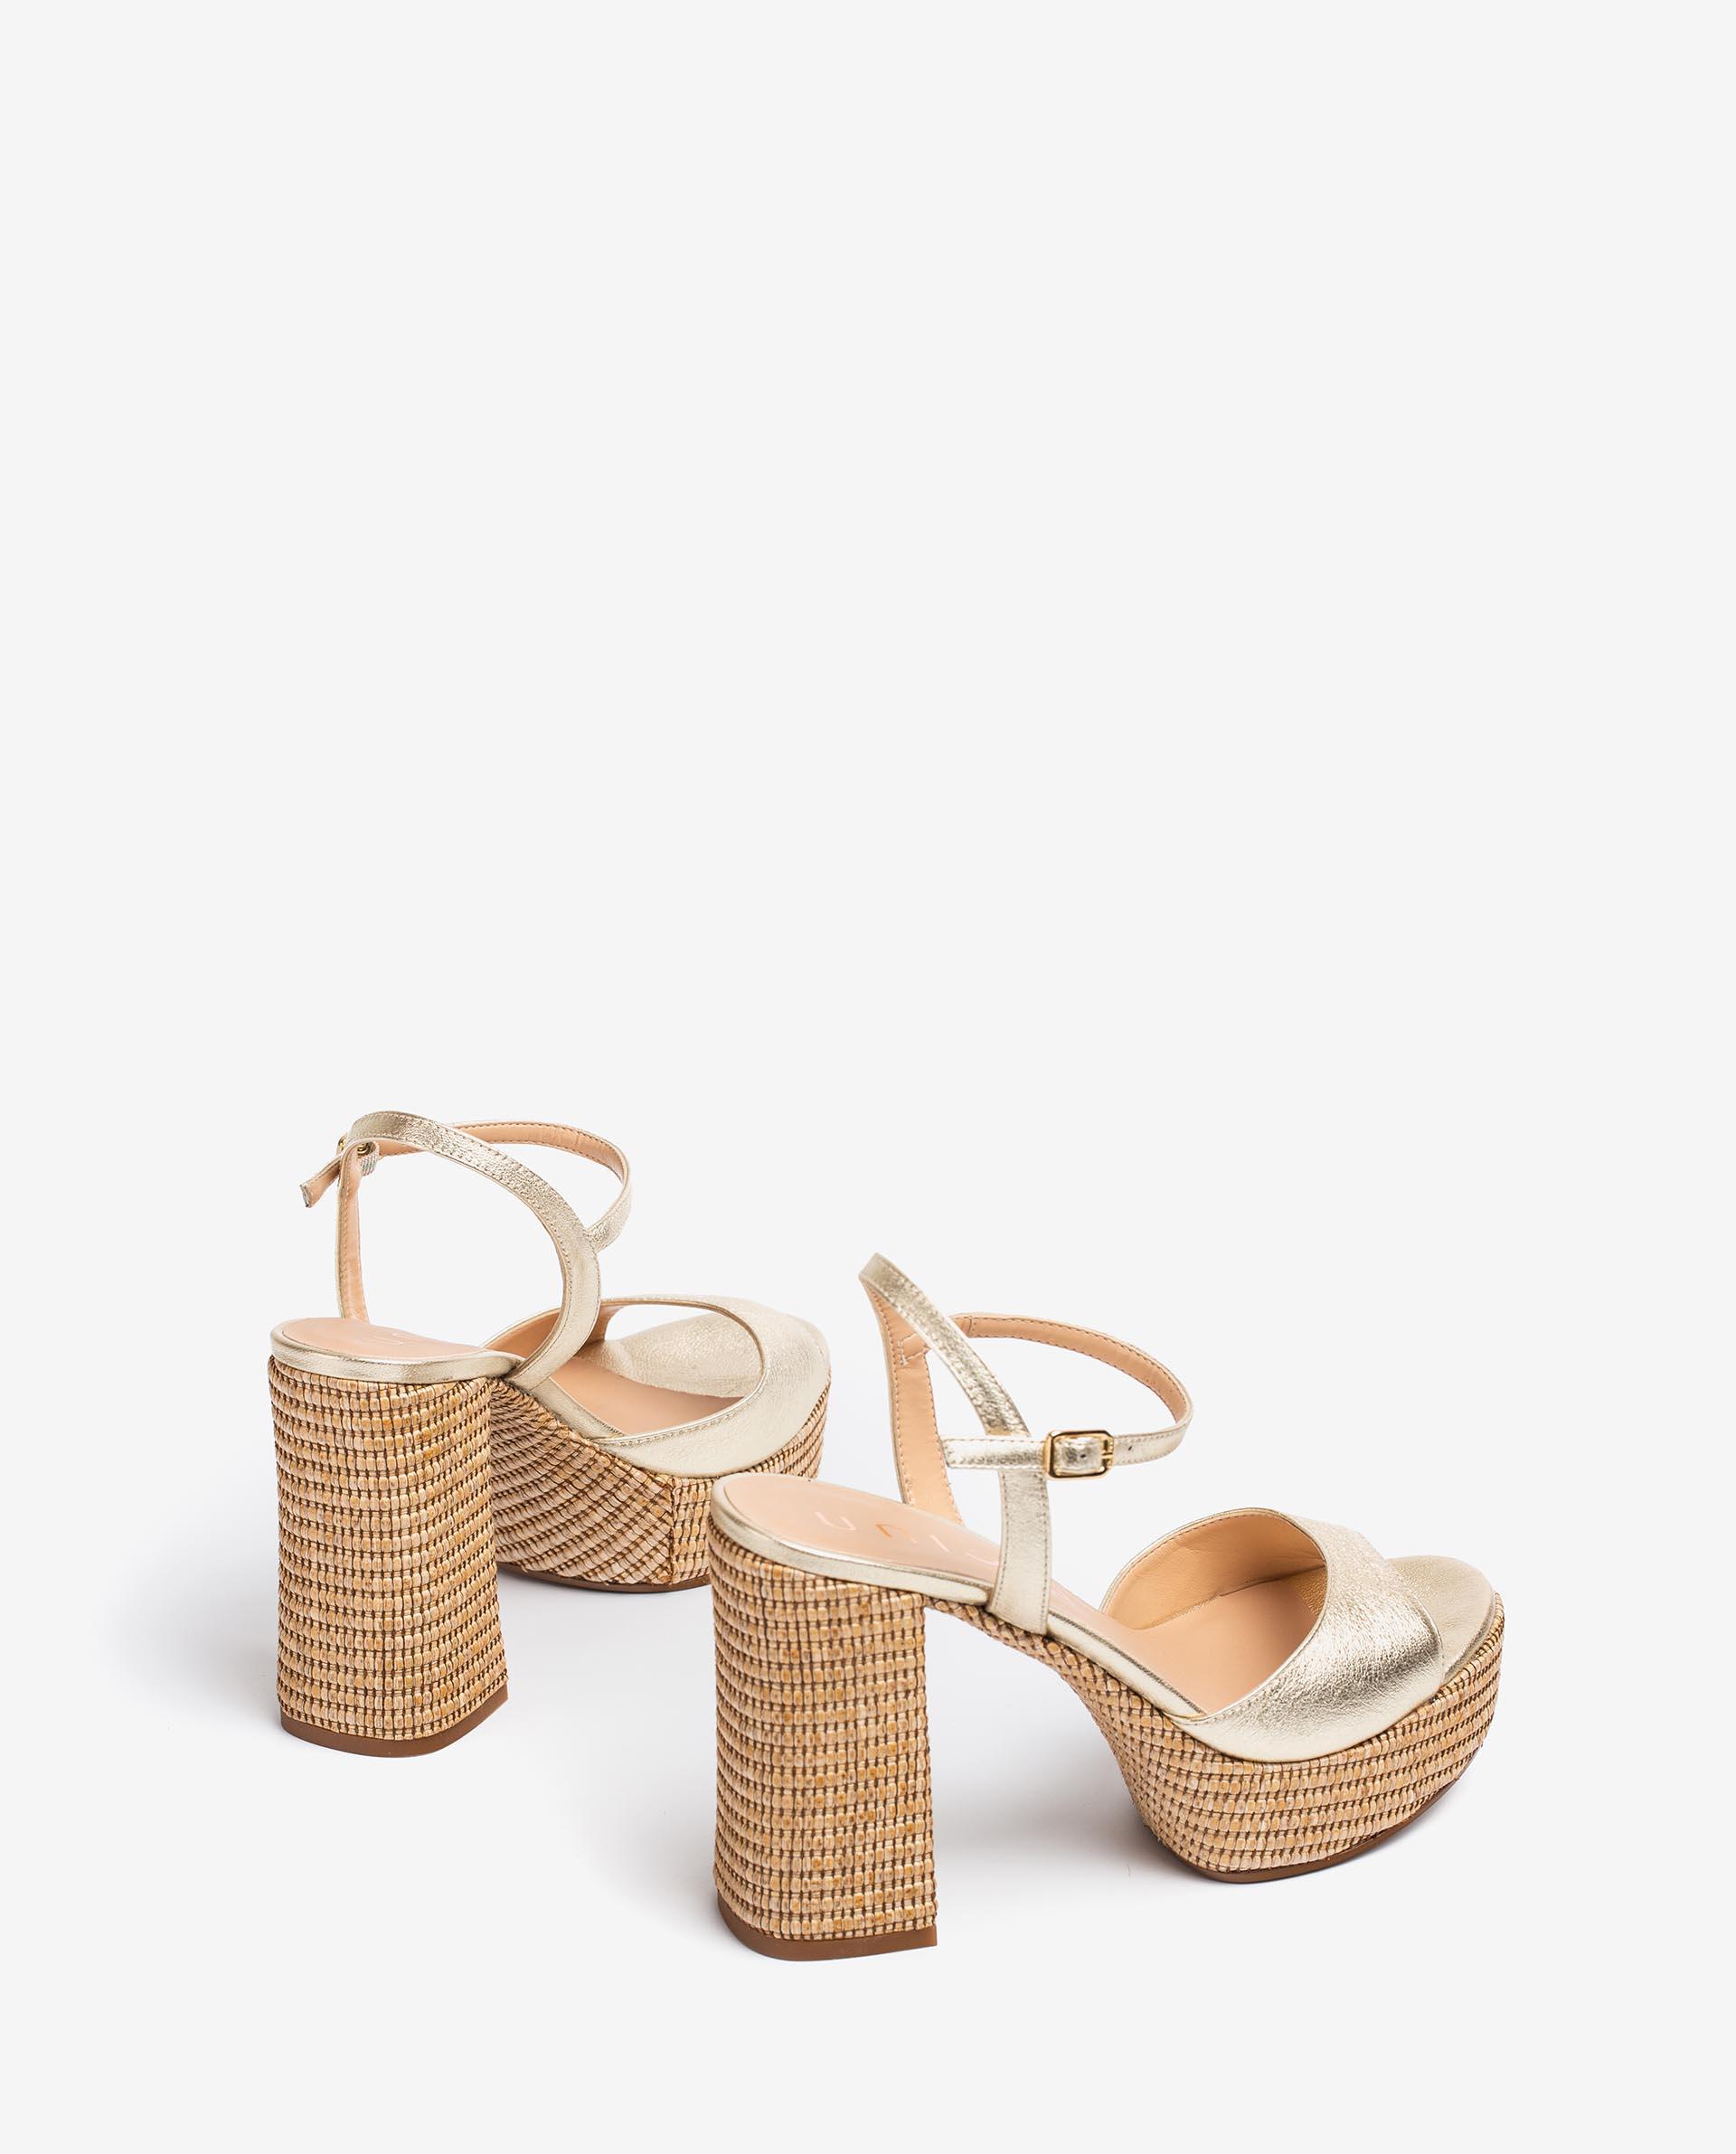 UNISA 70's style leather and raffia contrast sandals VEGARA_21_LMT_RR 2